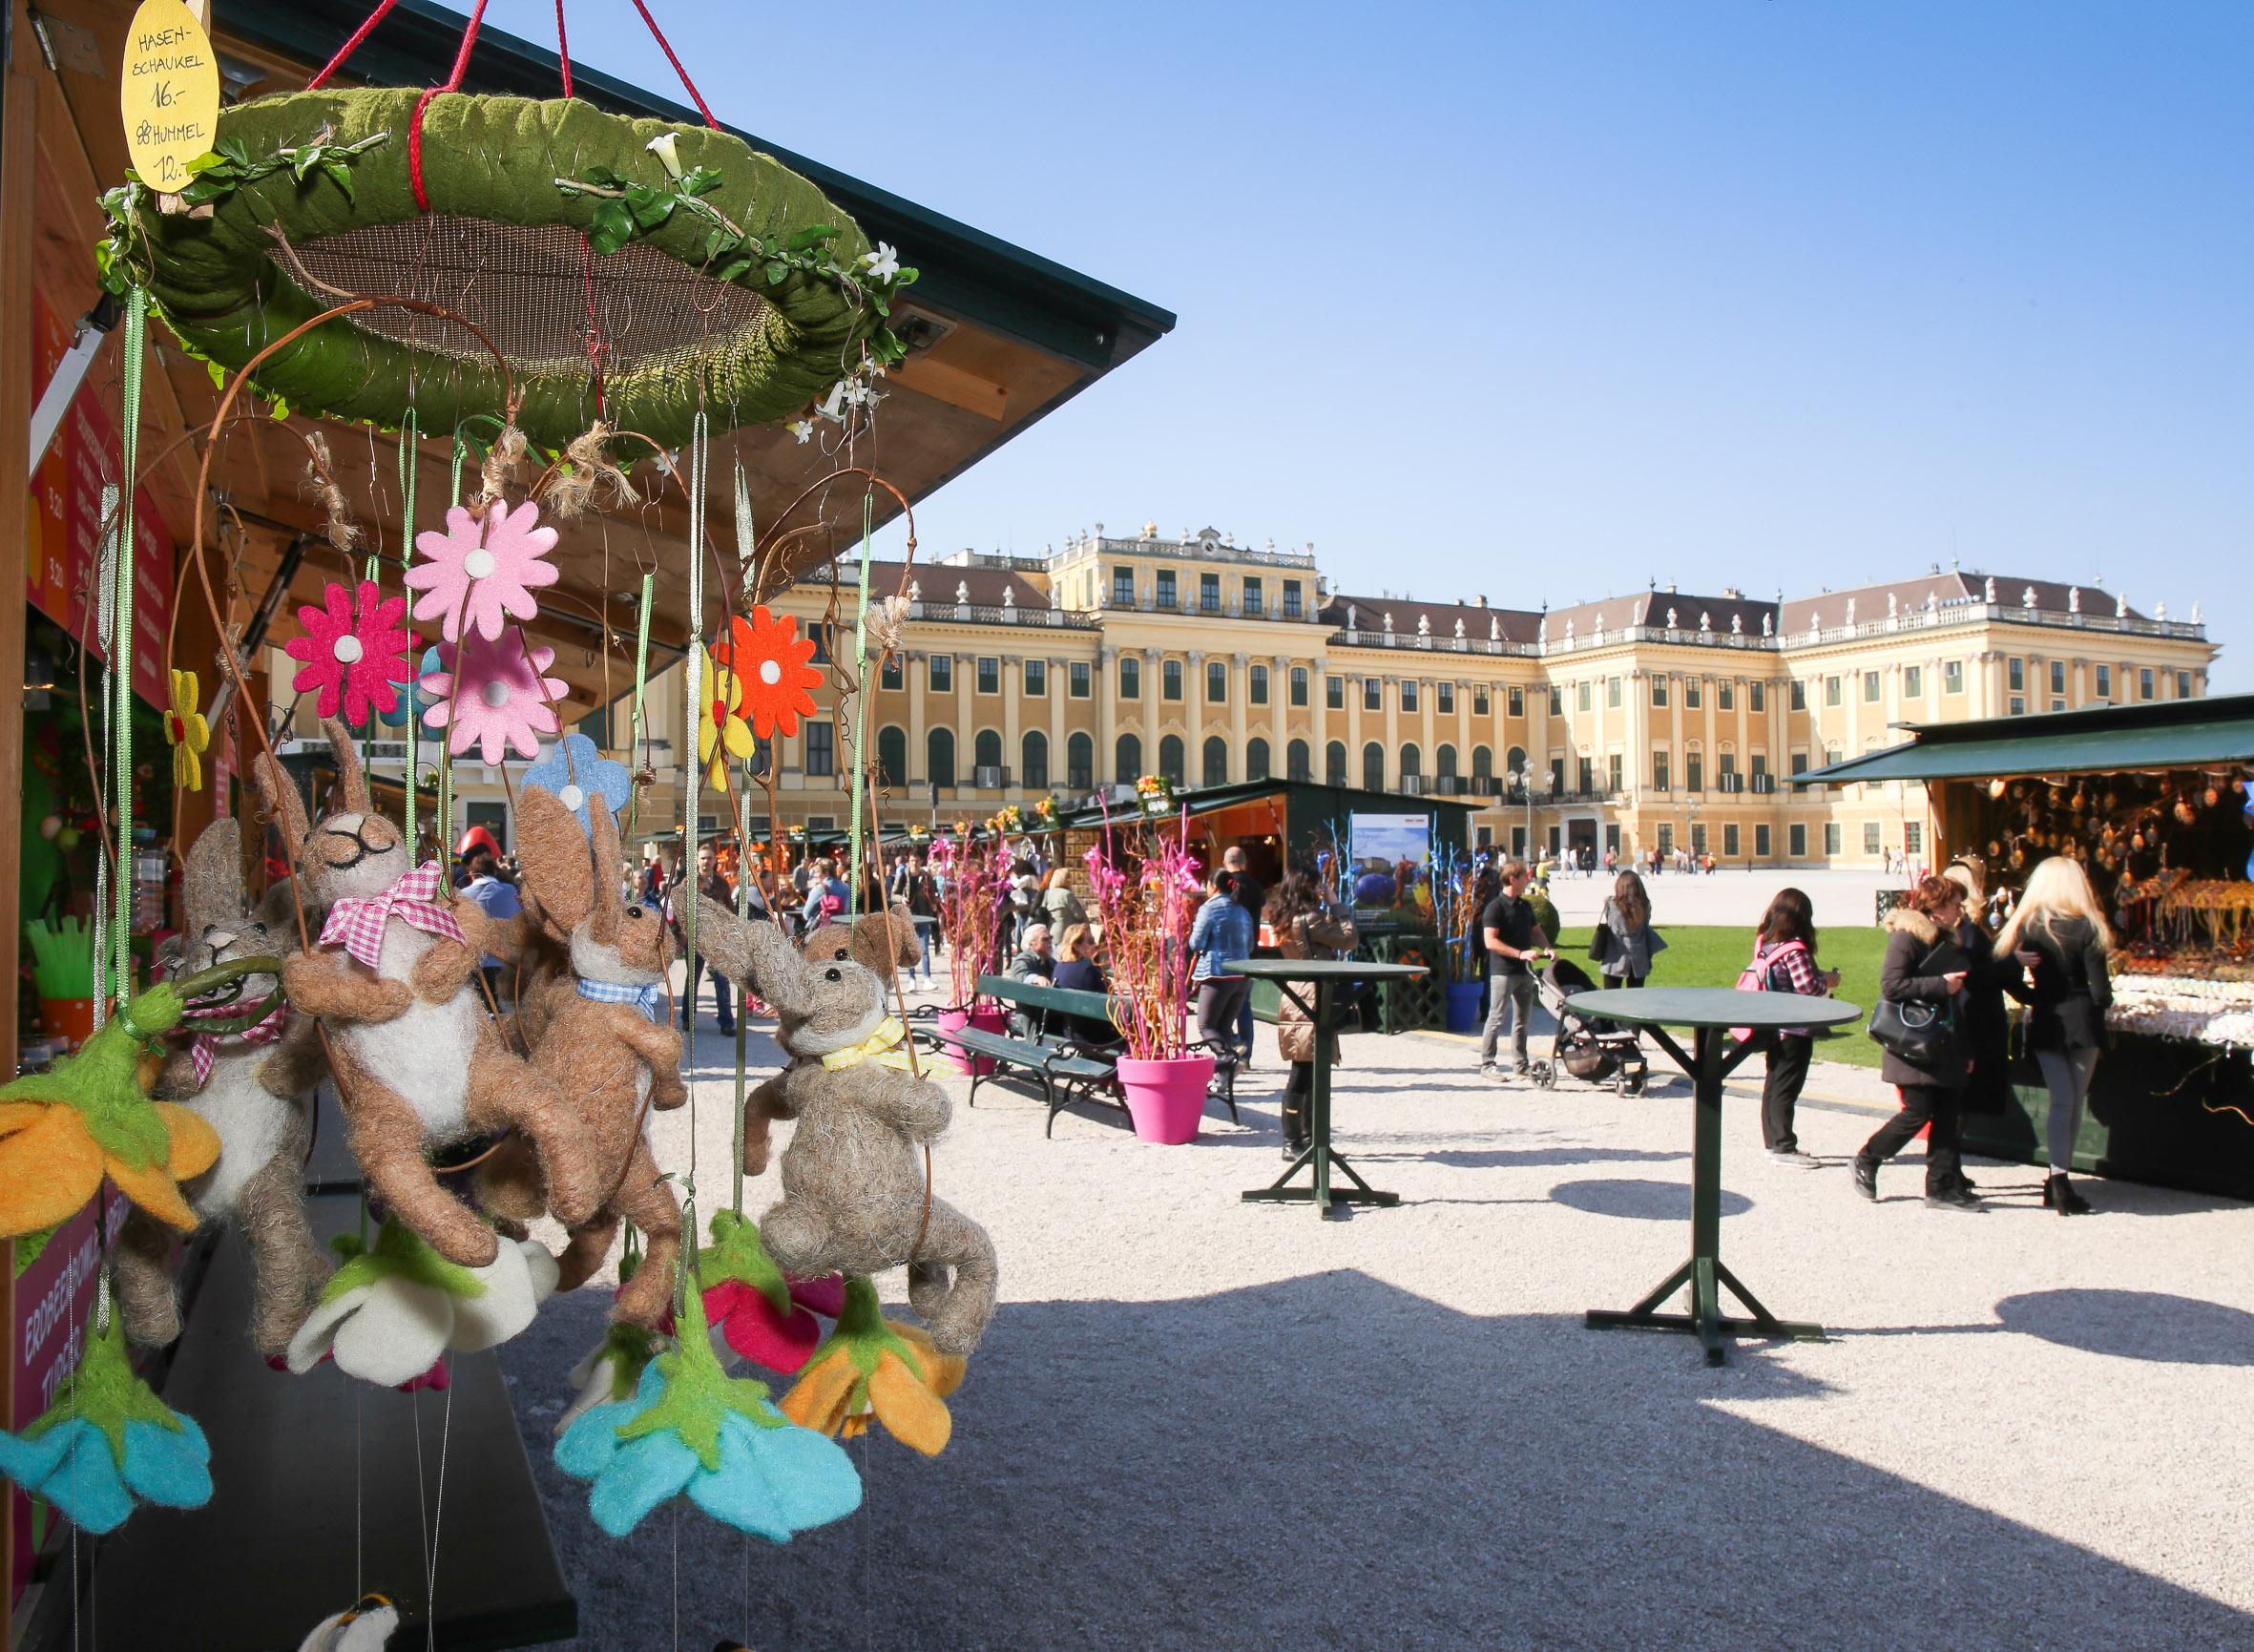 Ostermarkt Schloß Schönbrunn © FOTOFALLY